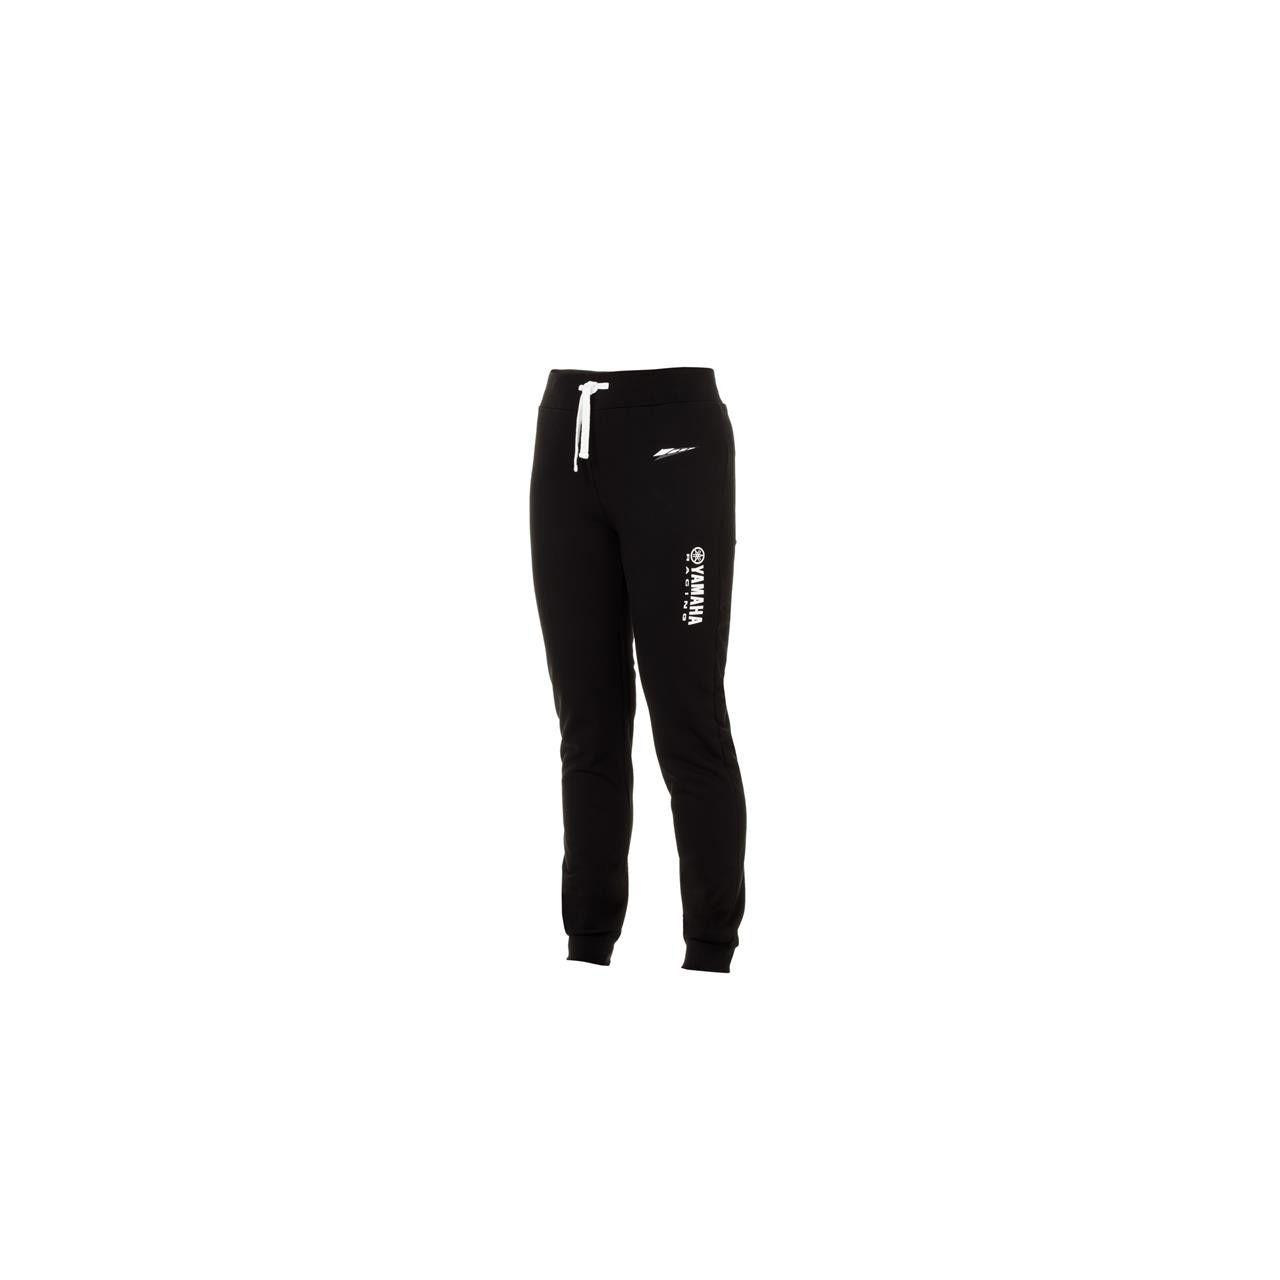 YAMAHA Pantalon Casual femme Paddock 2018